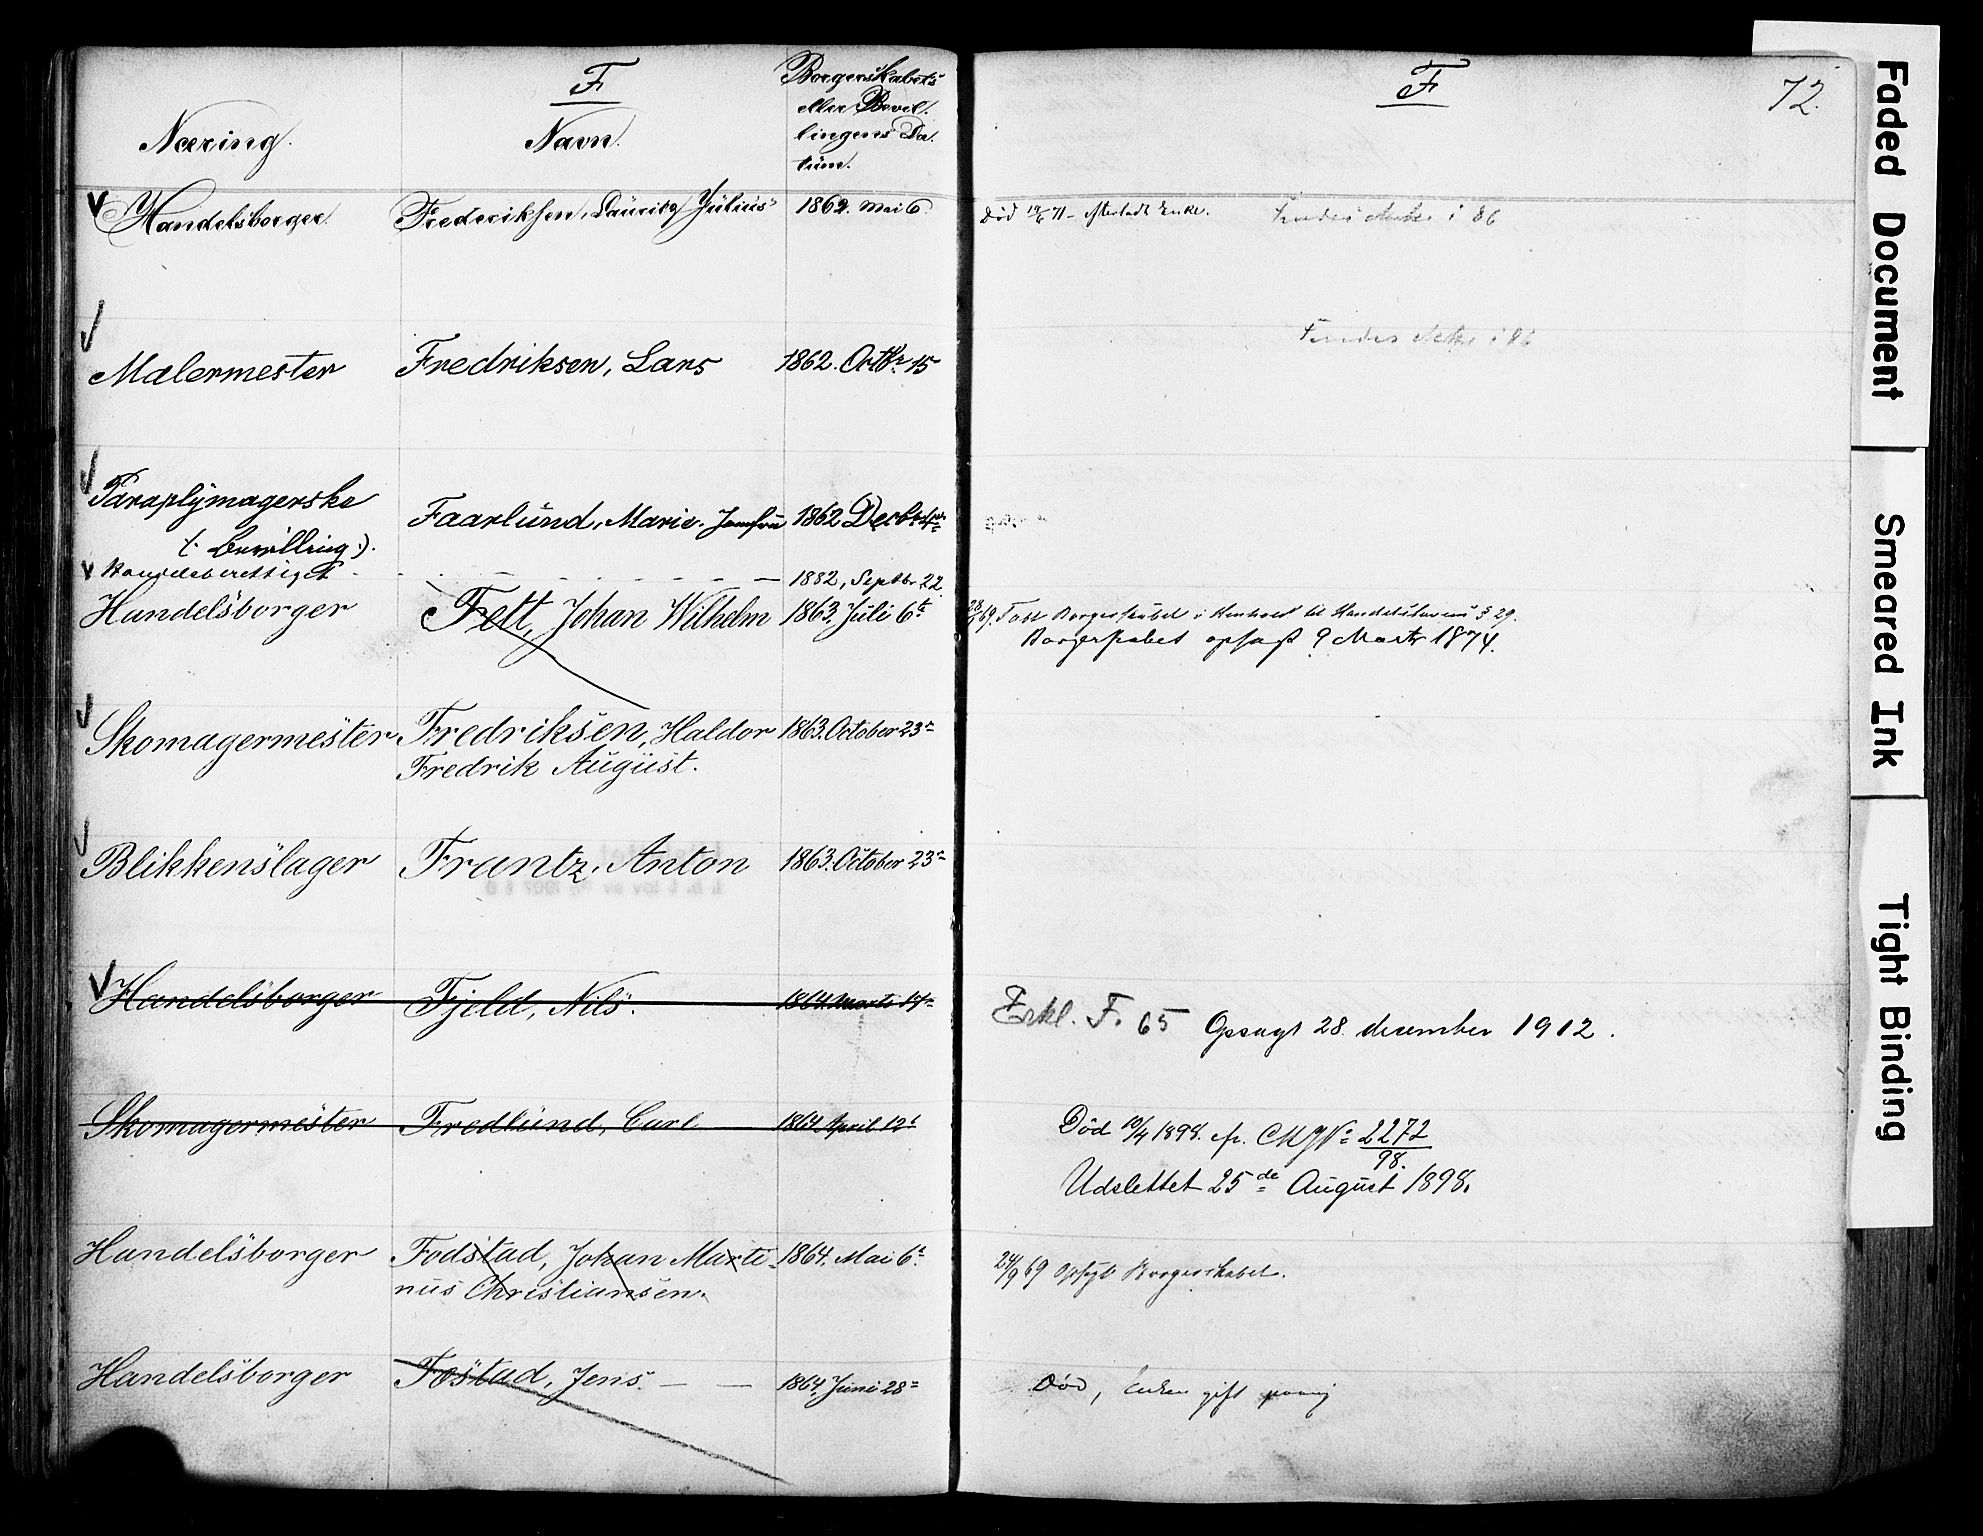 SAO, Kristiania magistrat, F/Fb/L0004: Borgerrulle, 1860-1879, s. 74